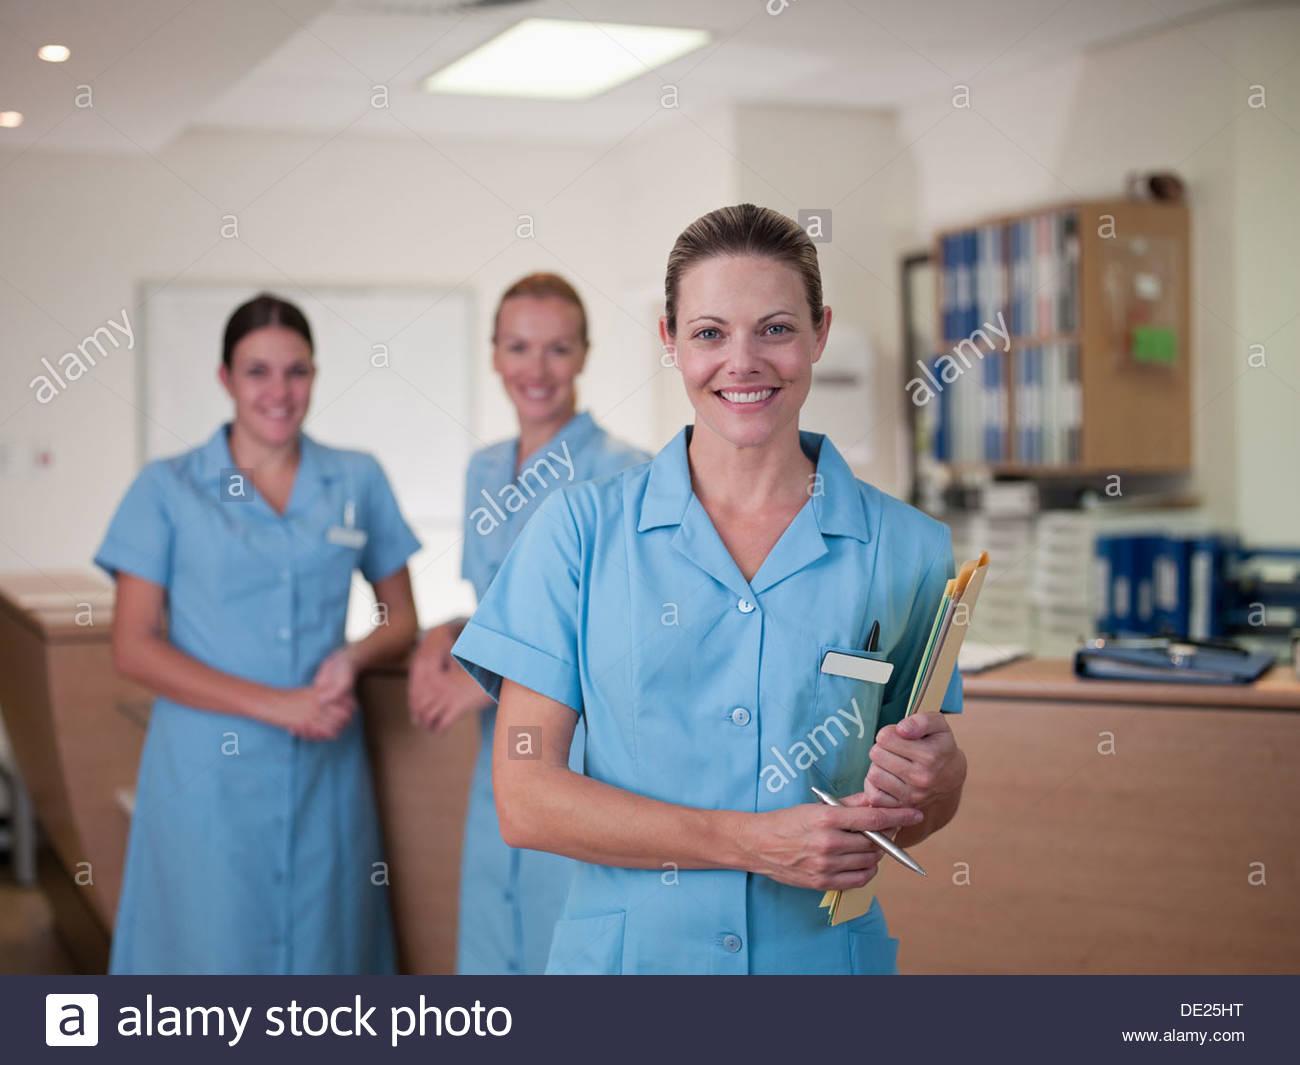 Nurse holding medical chart in hospital Photo Stock